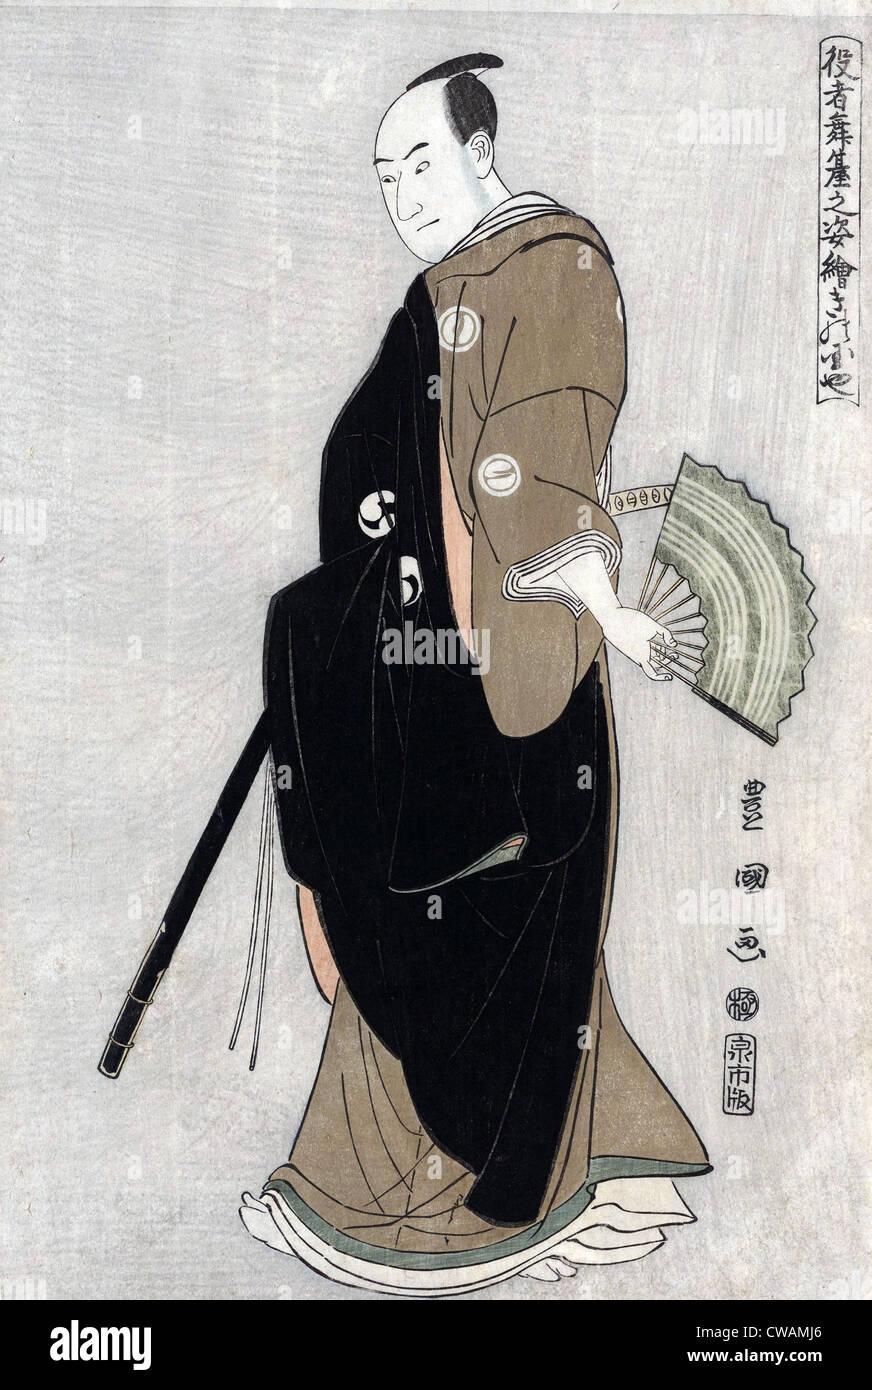 Japanese woodcut by Toyokuni Utagawa (1769-1825) of actor Sawamura Sanj-ro III holding a fan, in the role of Oboshi - Stock Image